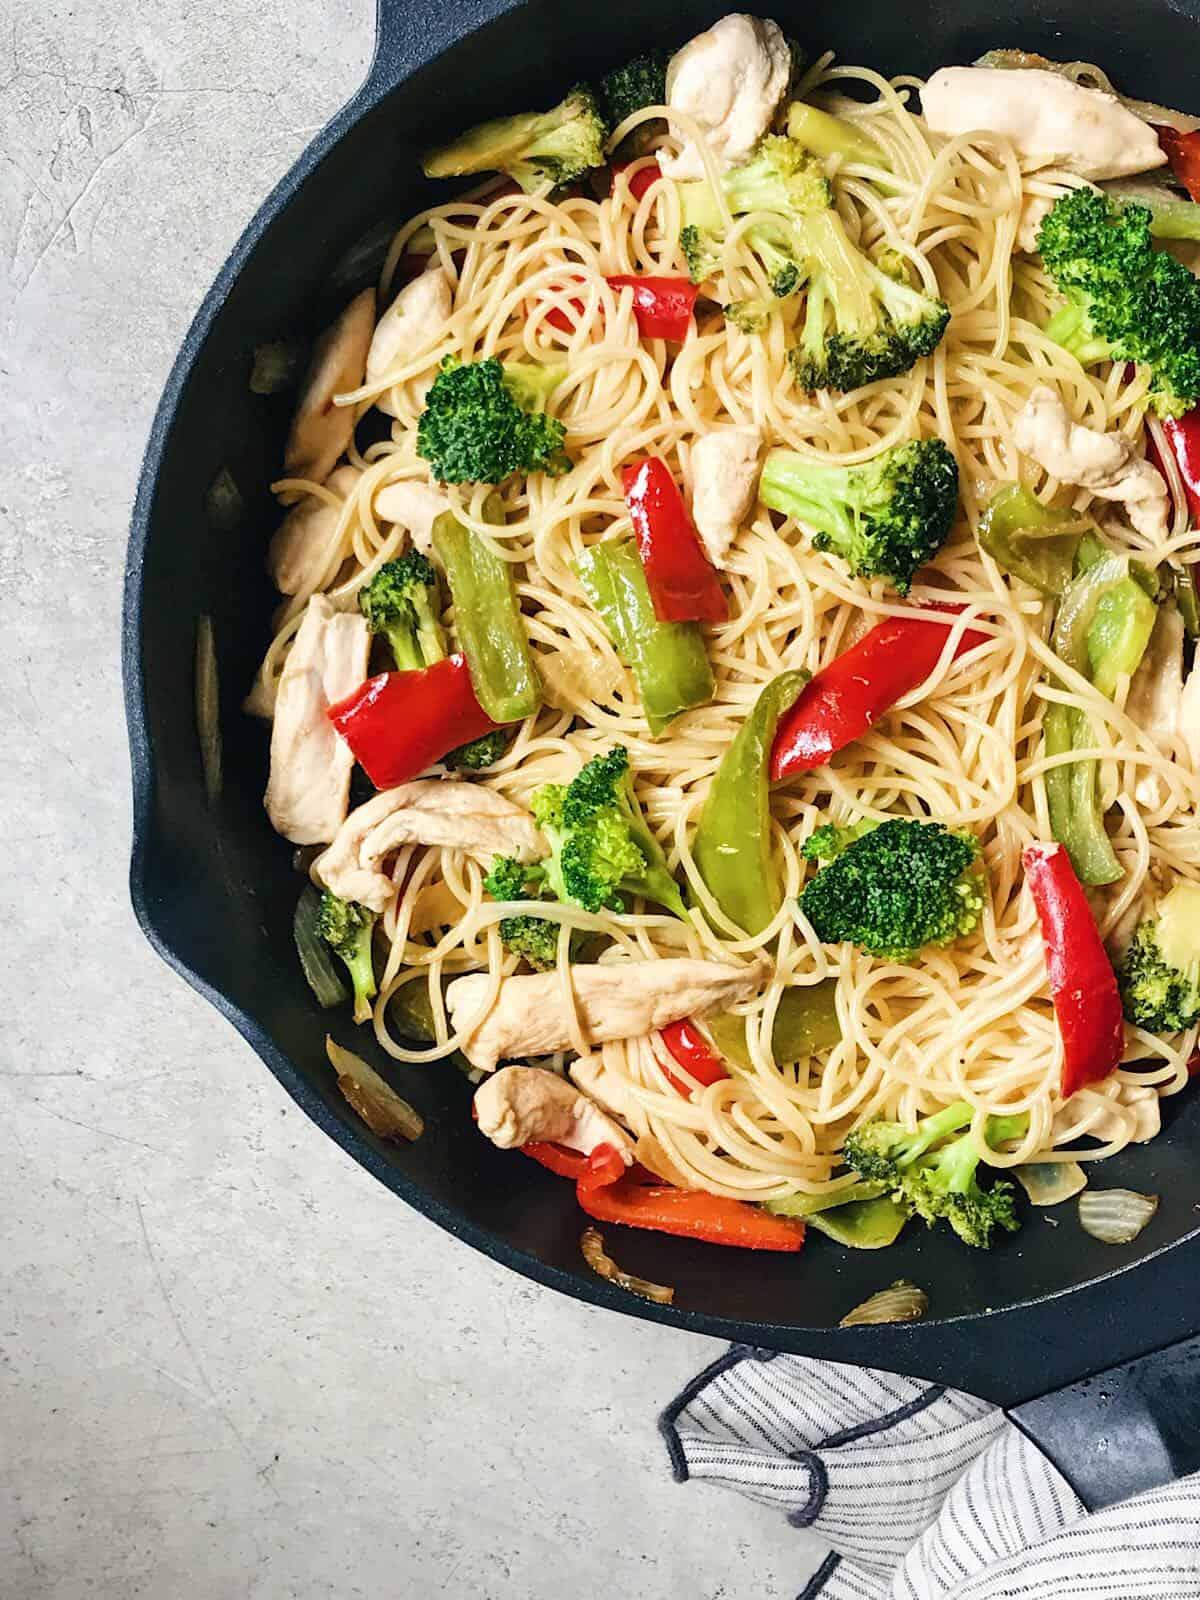 espaguetis con verdura y pollo